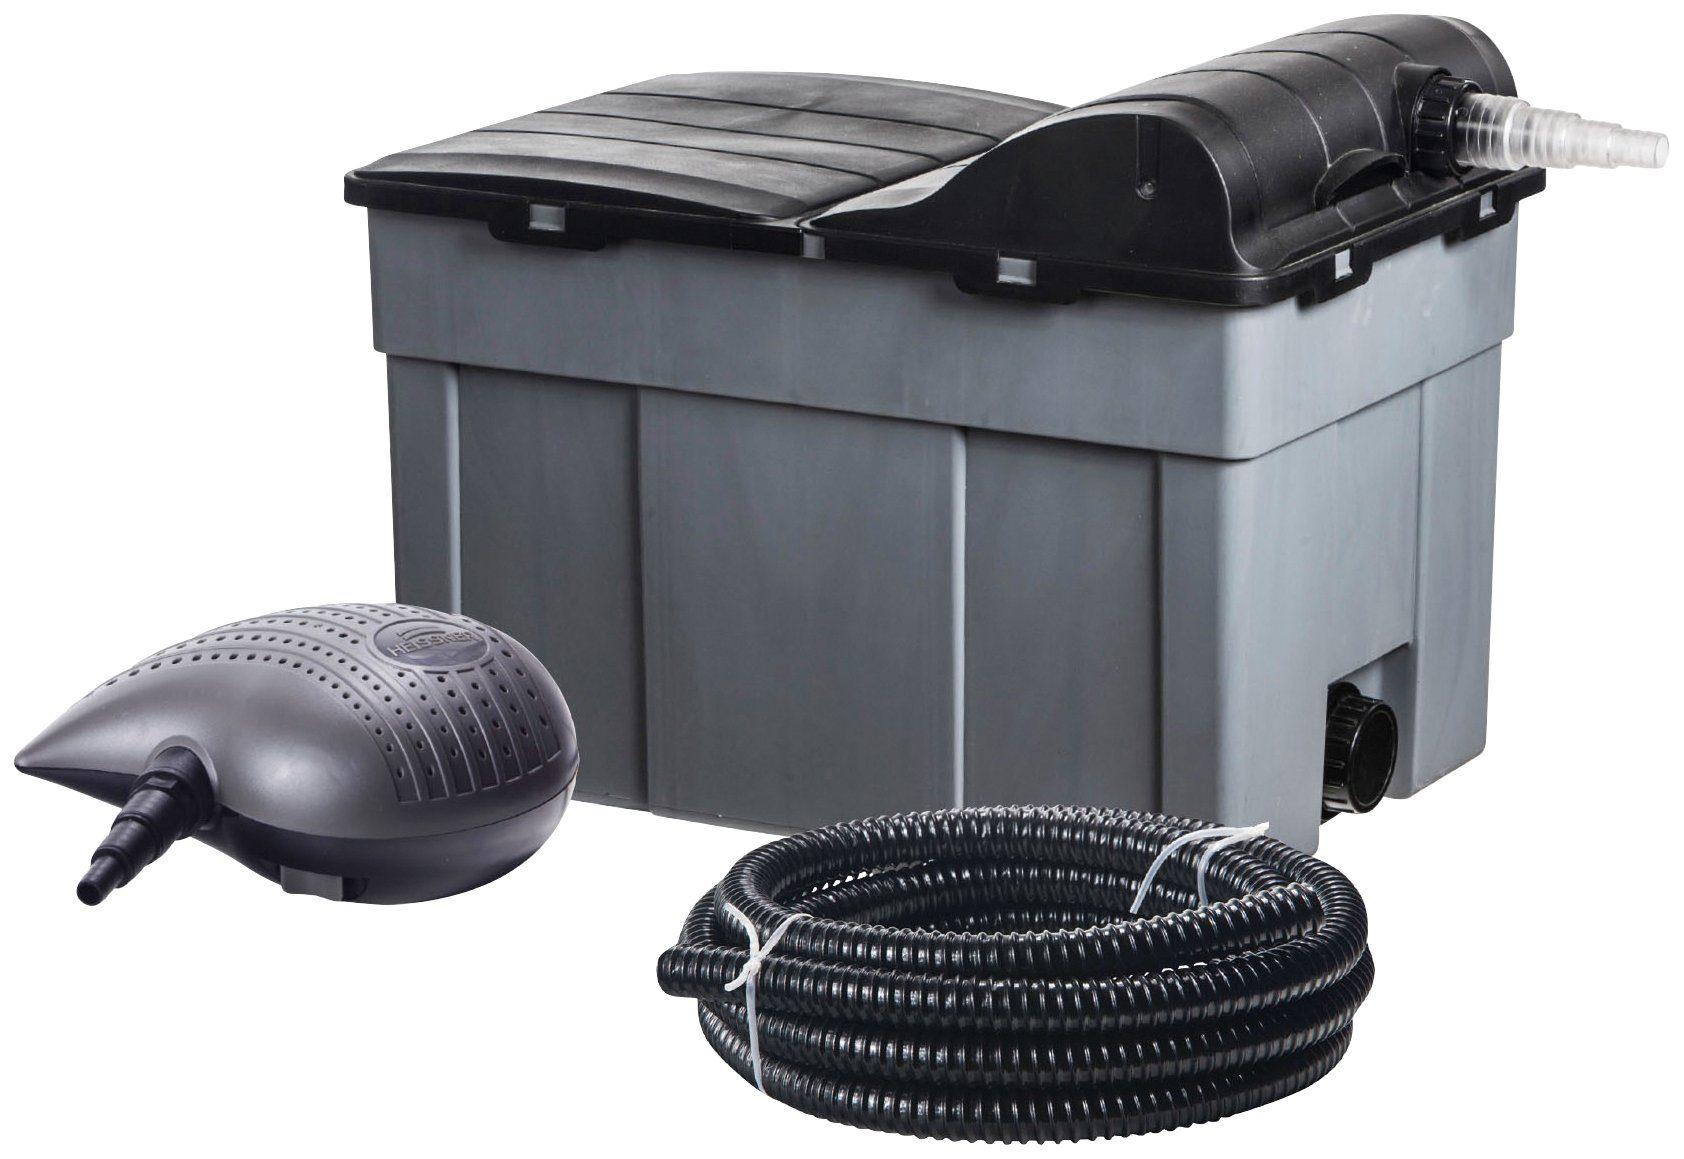 HEISSNER Teichfilter »FPU16000-Set«, mit UVC-Klärer, Förderleistung:3.300 l/h